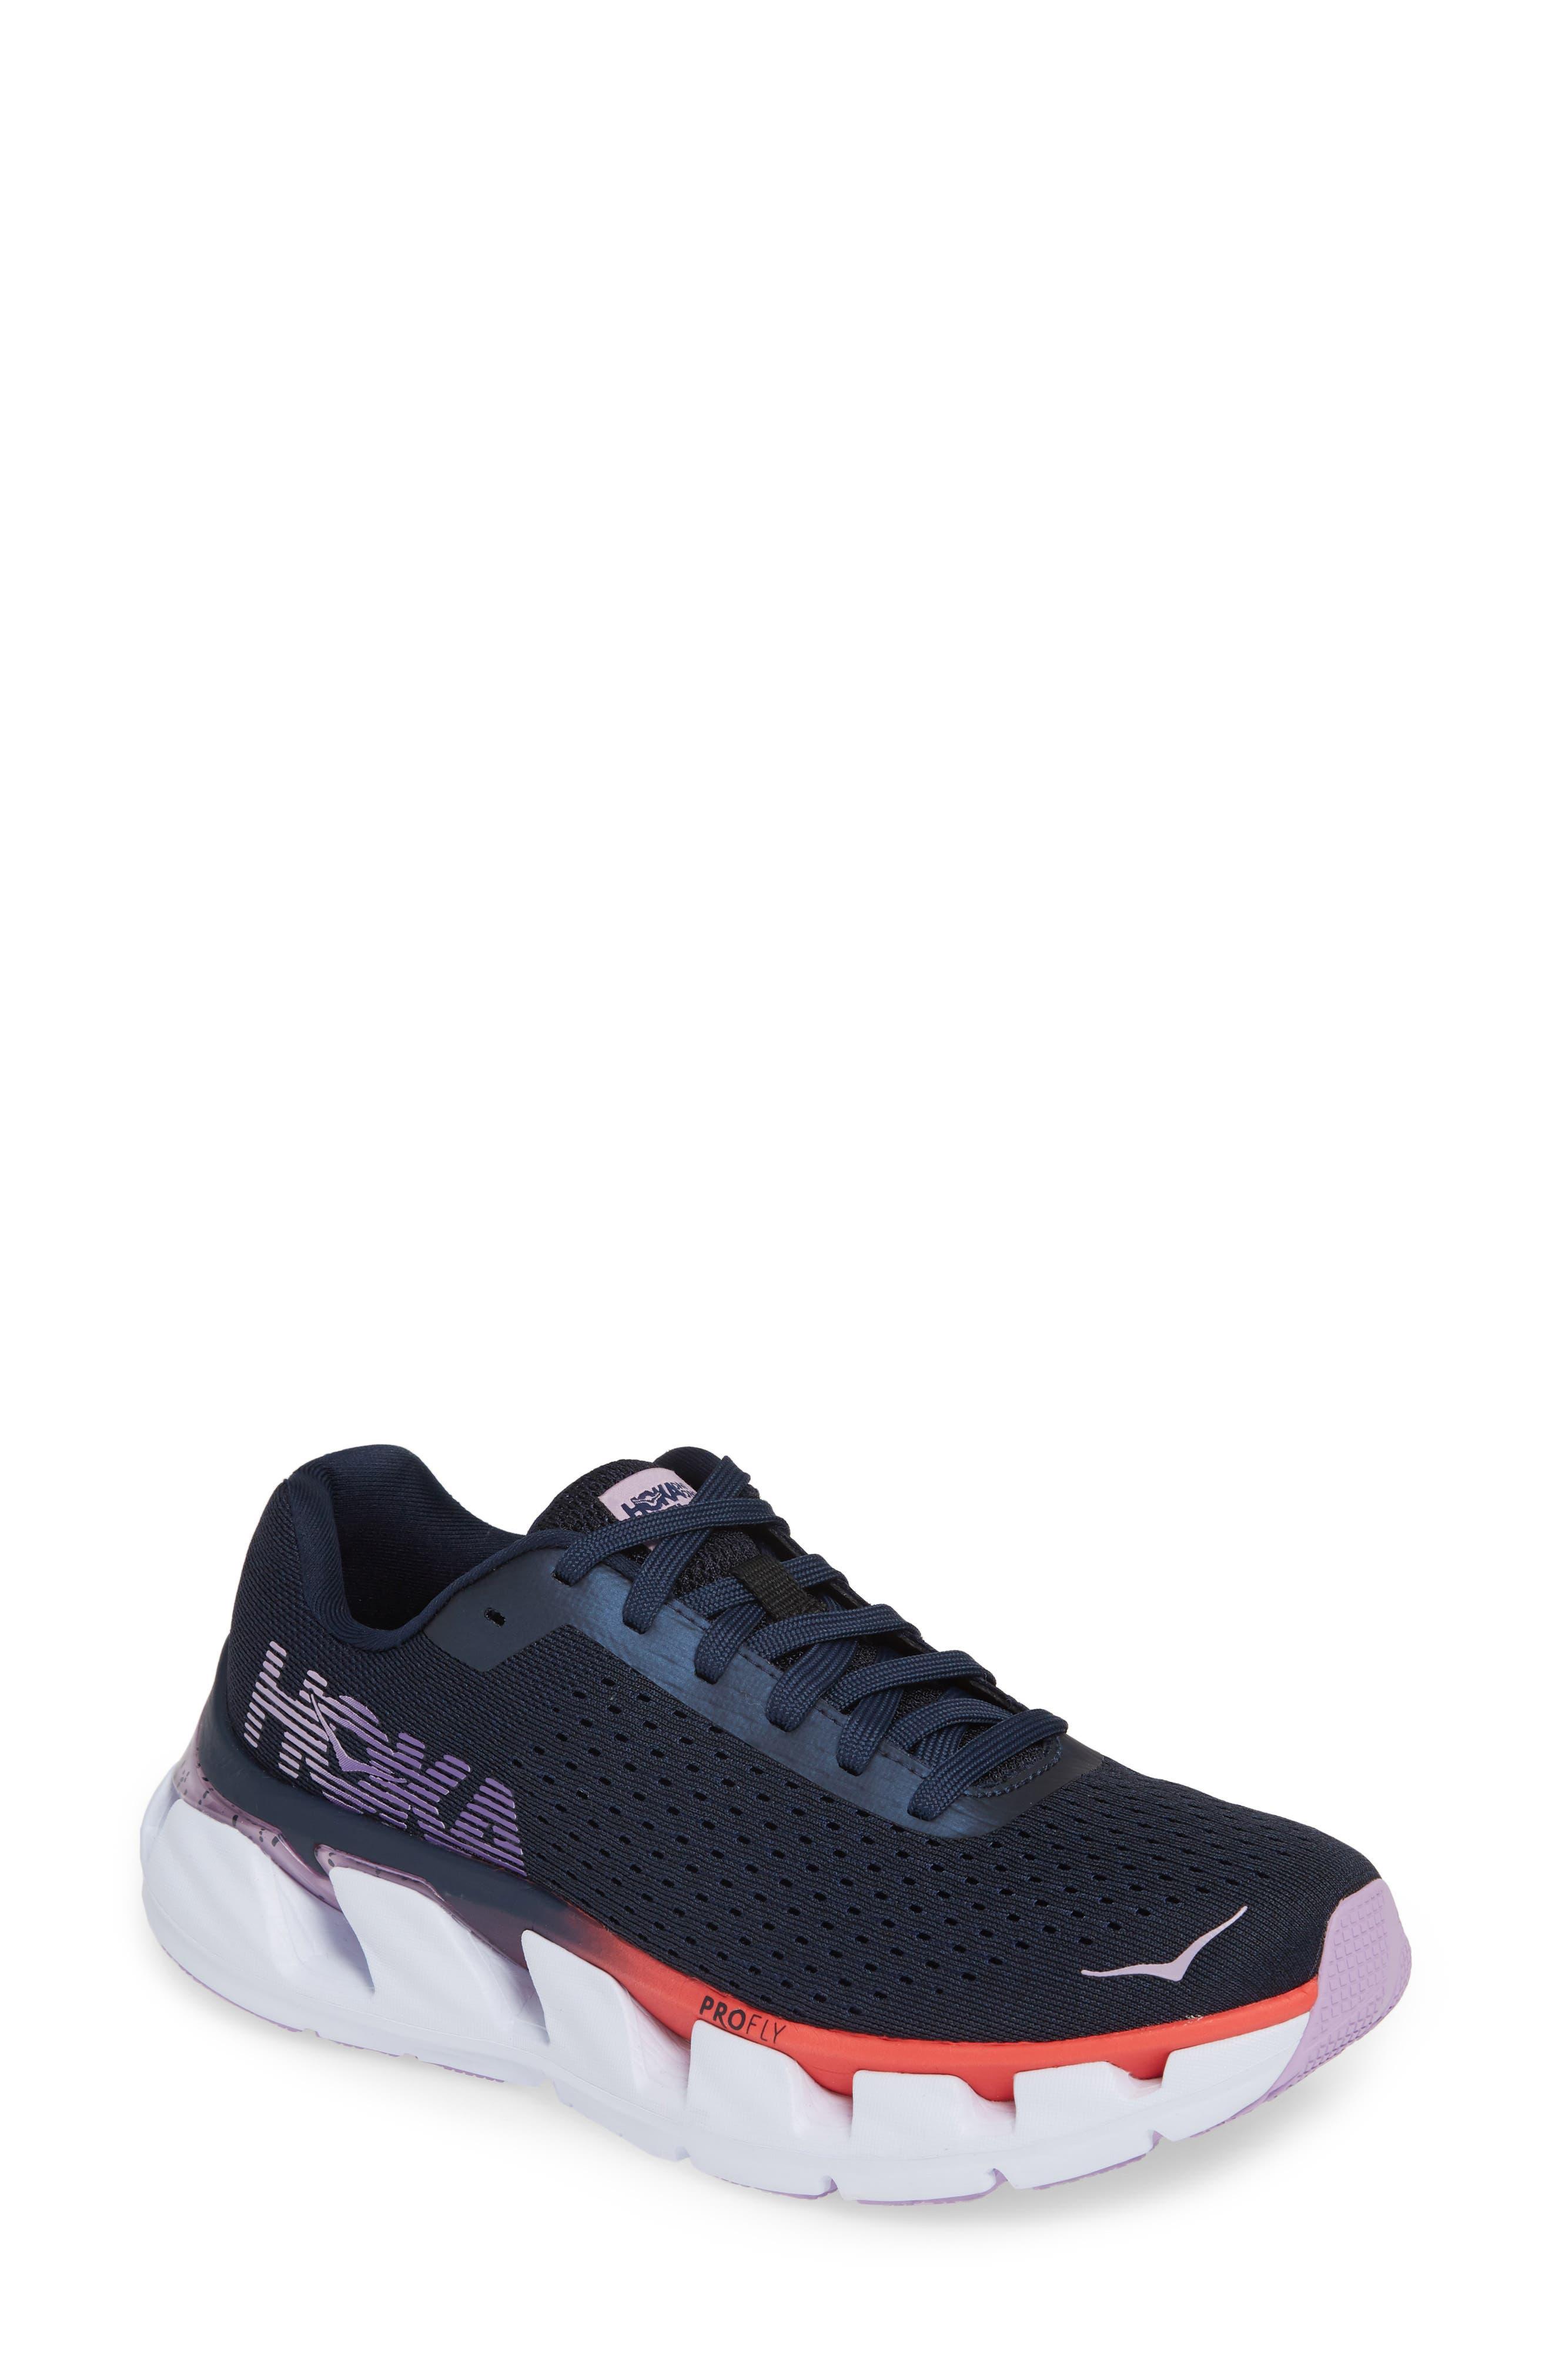 Elevon Running Shoe, Main, color, 001